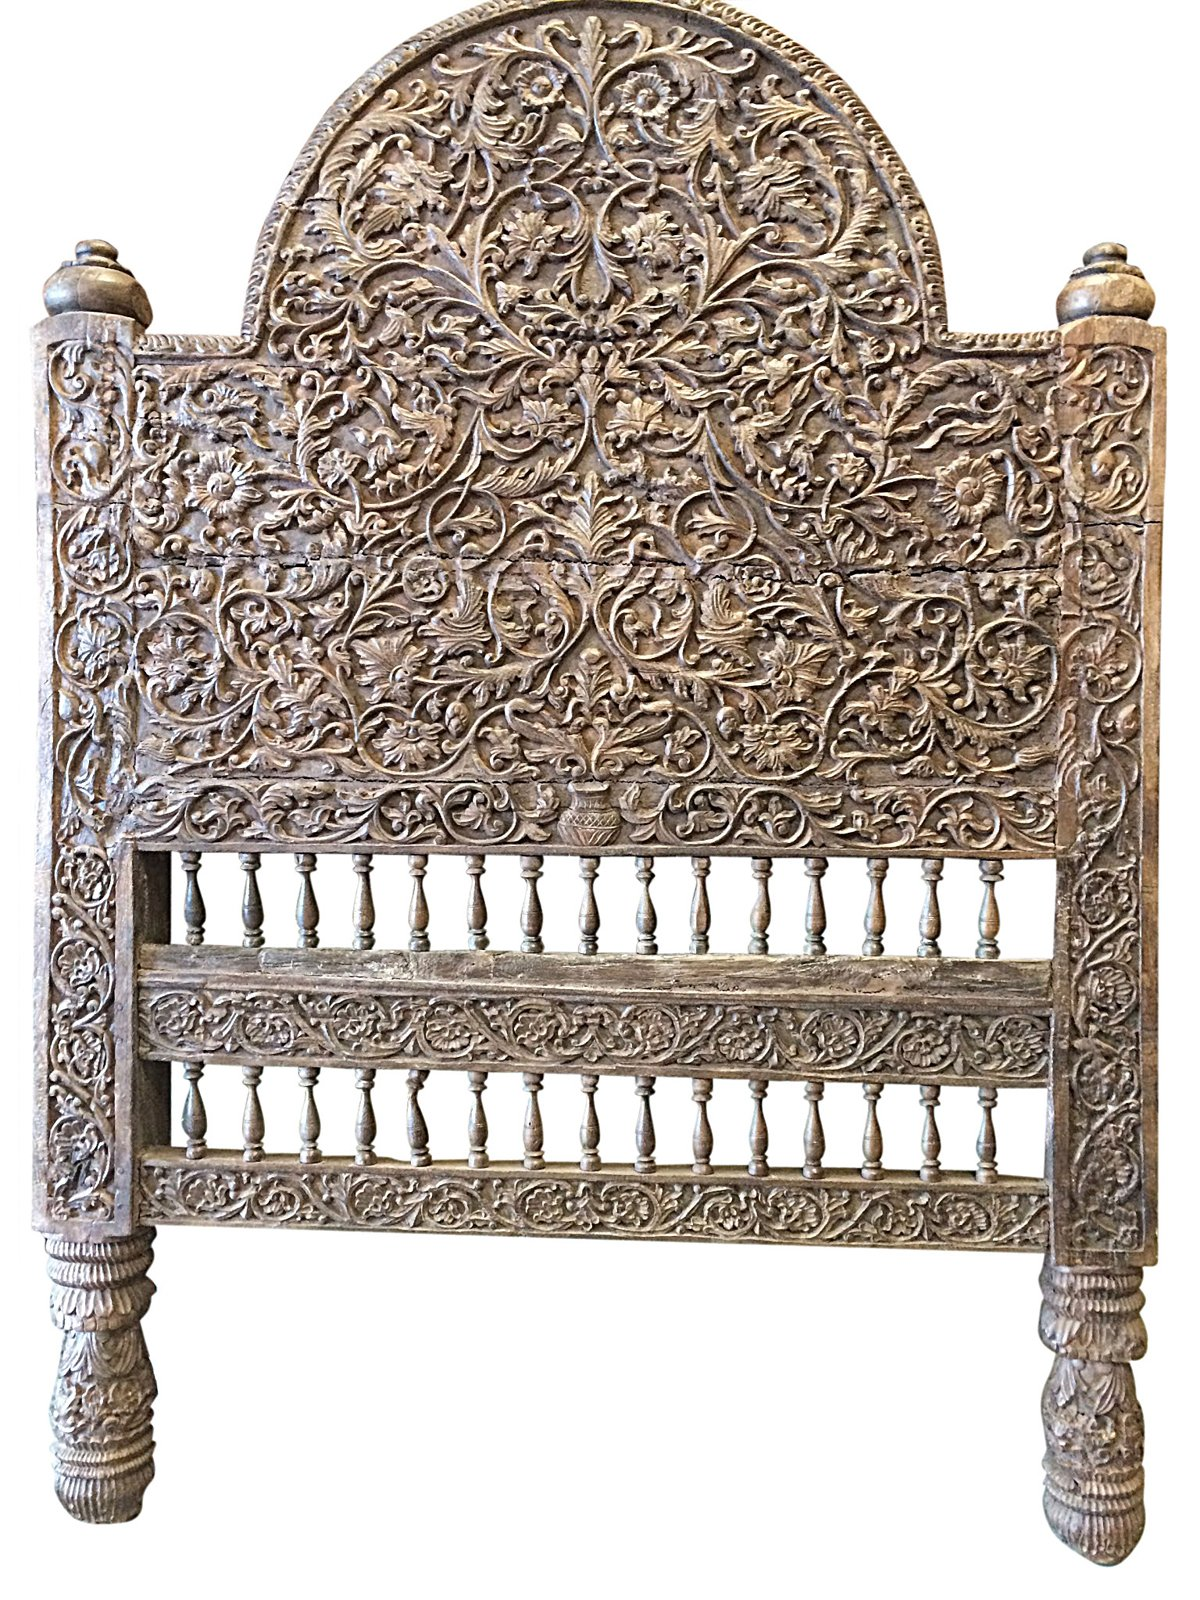 Antique Headboard Floral Hand Carved Teak Daybed Diwan India Furniture 18C